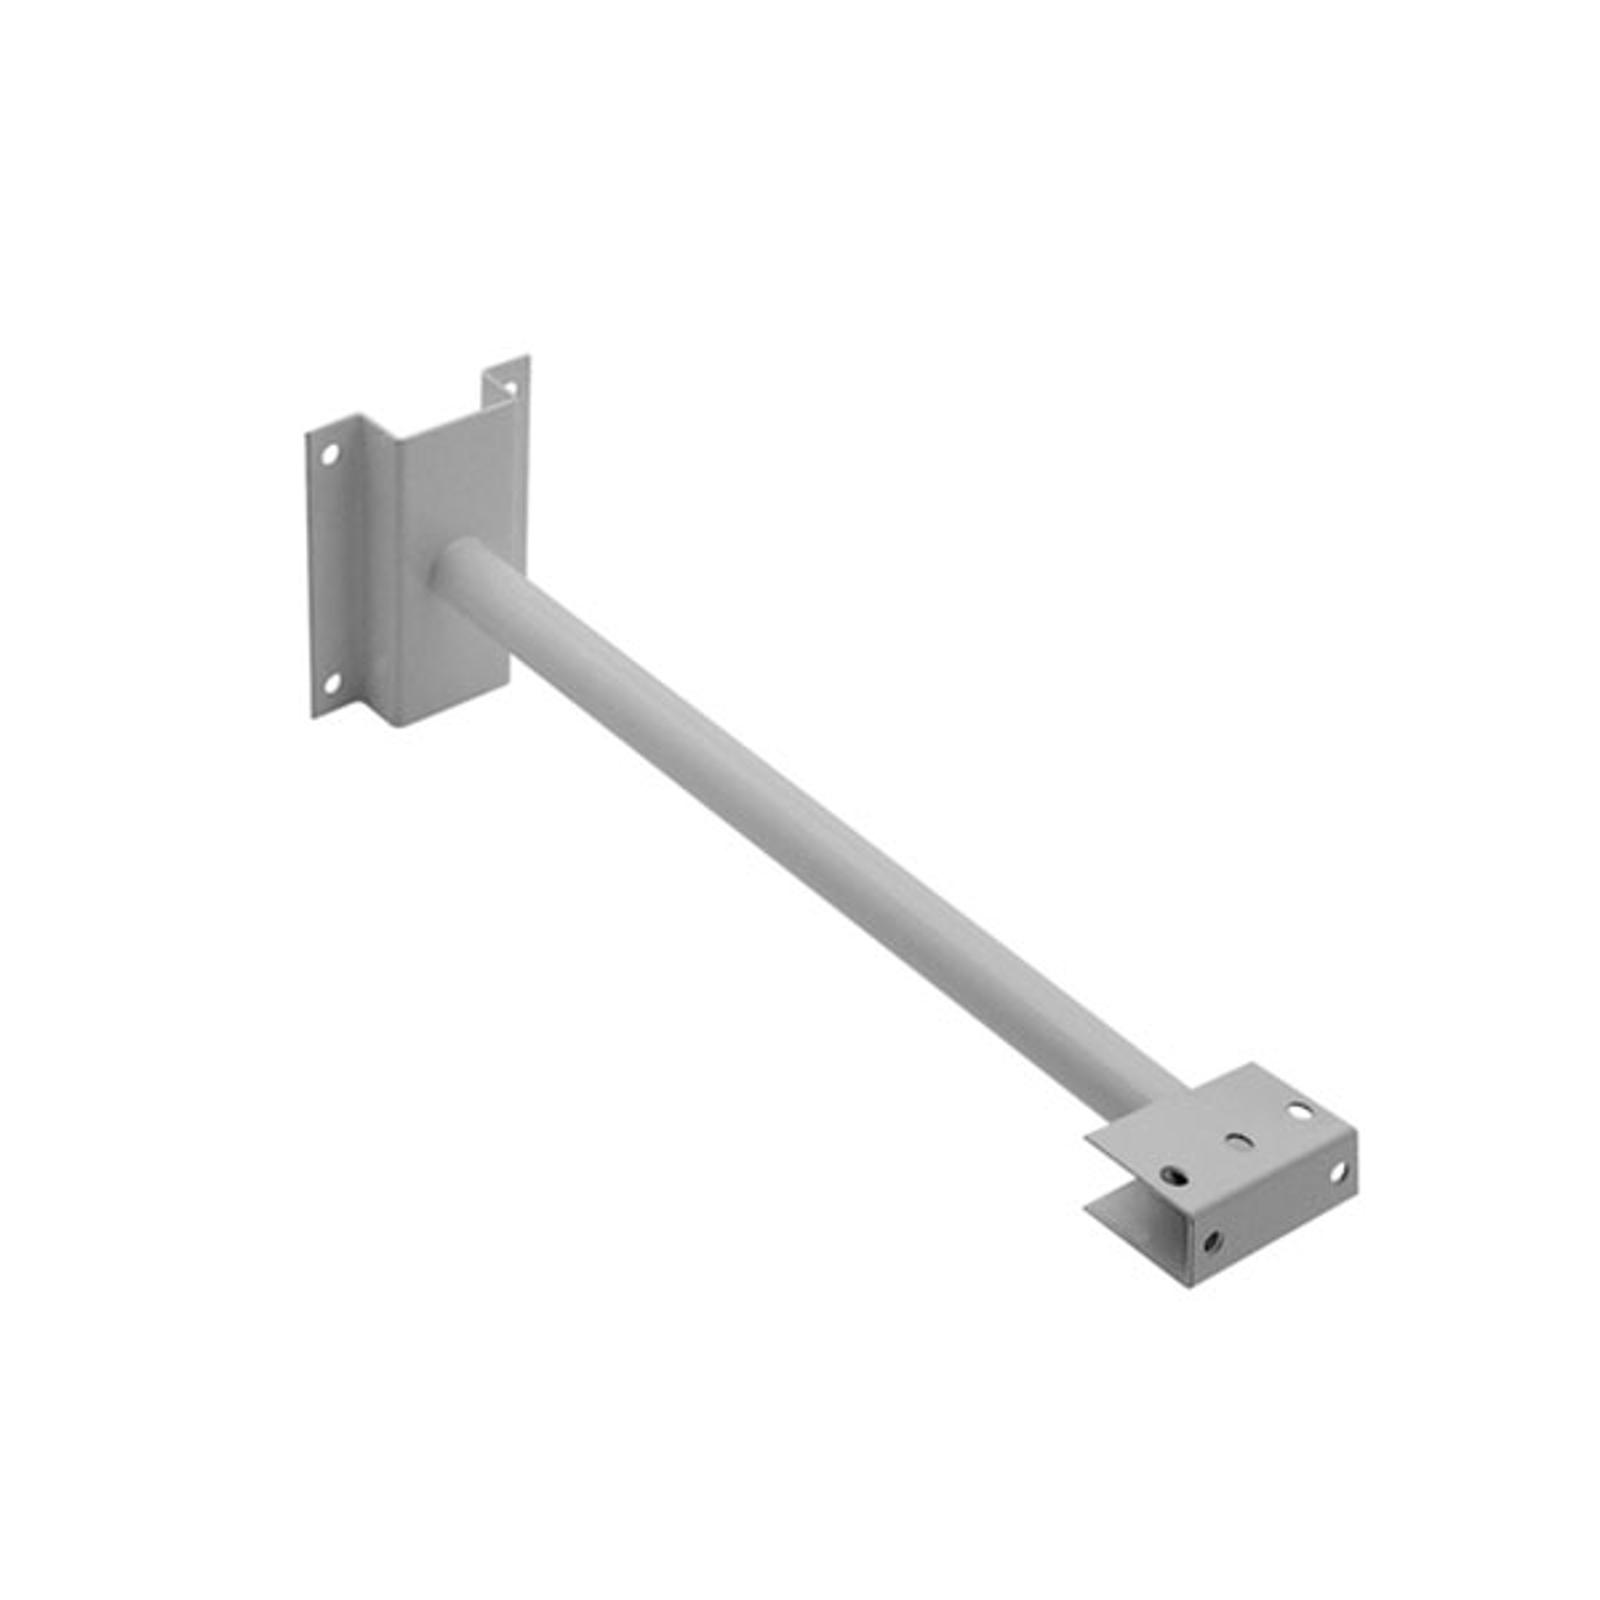 Wandhouder voor LED spot Guell 1/2 - 50 cm